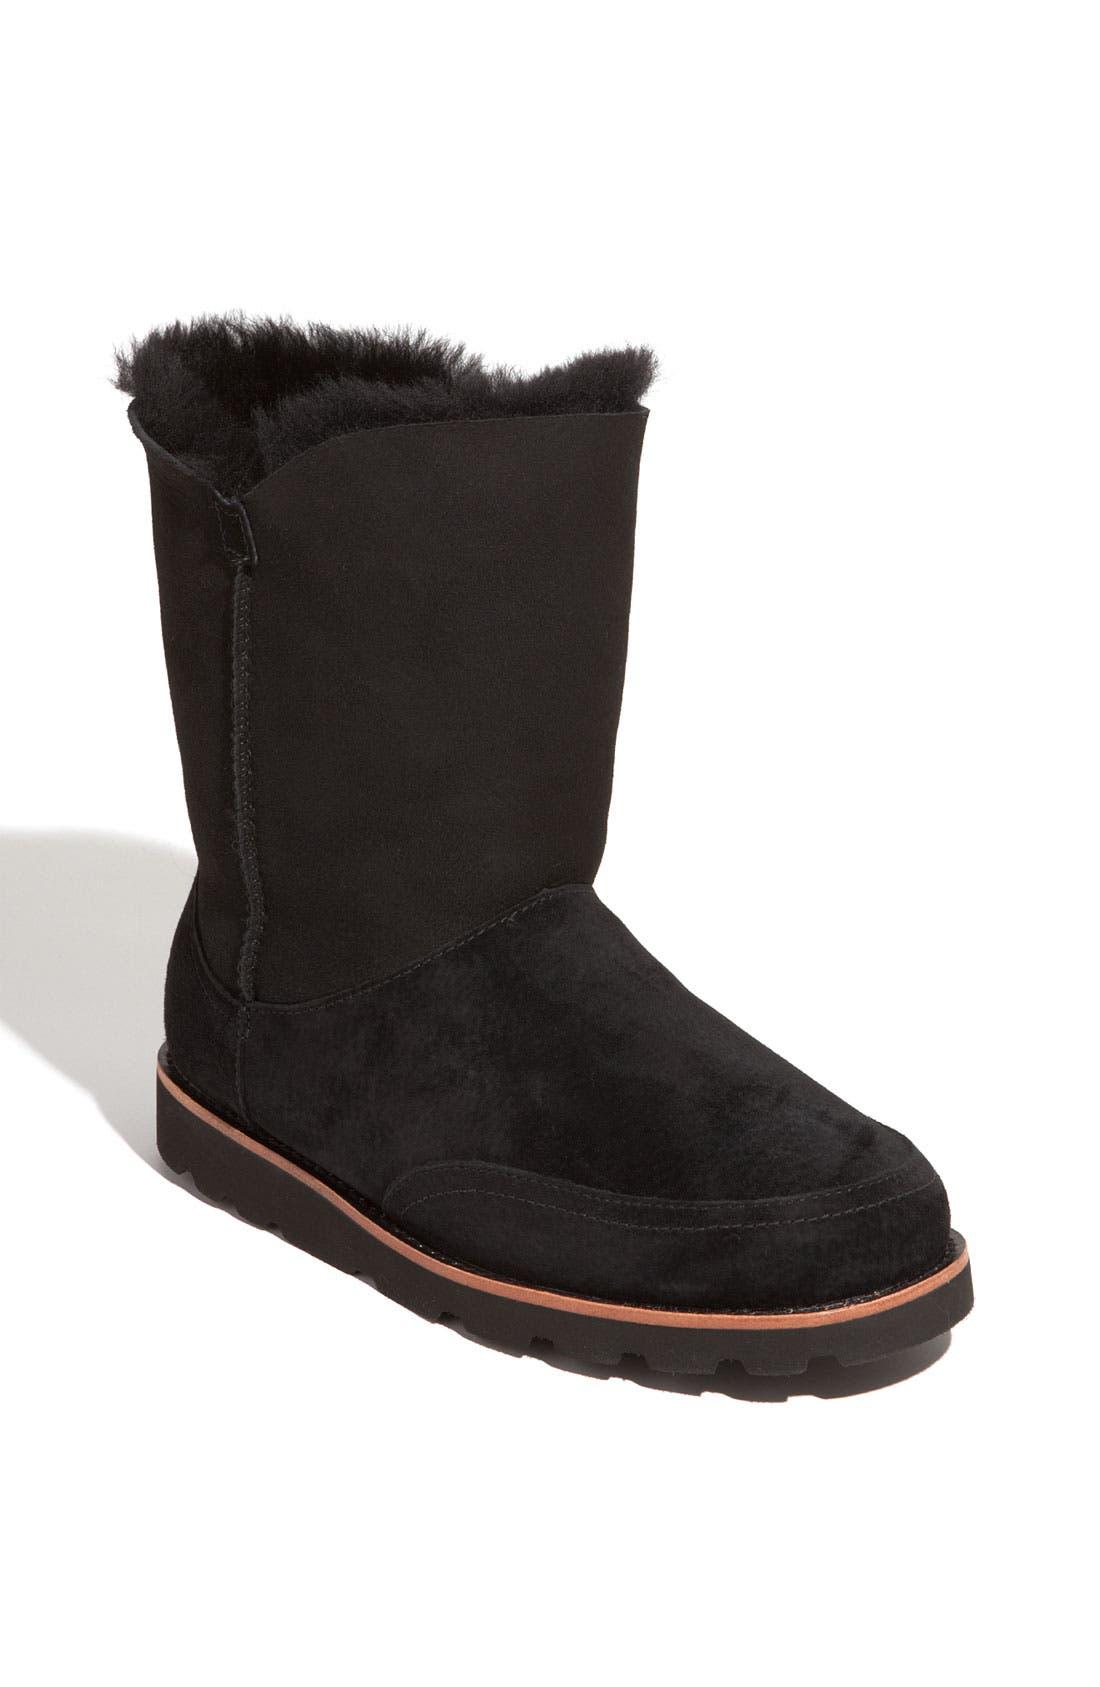 Australia 'Shanleigh' Boot,                             Main thumbnail 1, color,                             Black